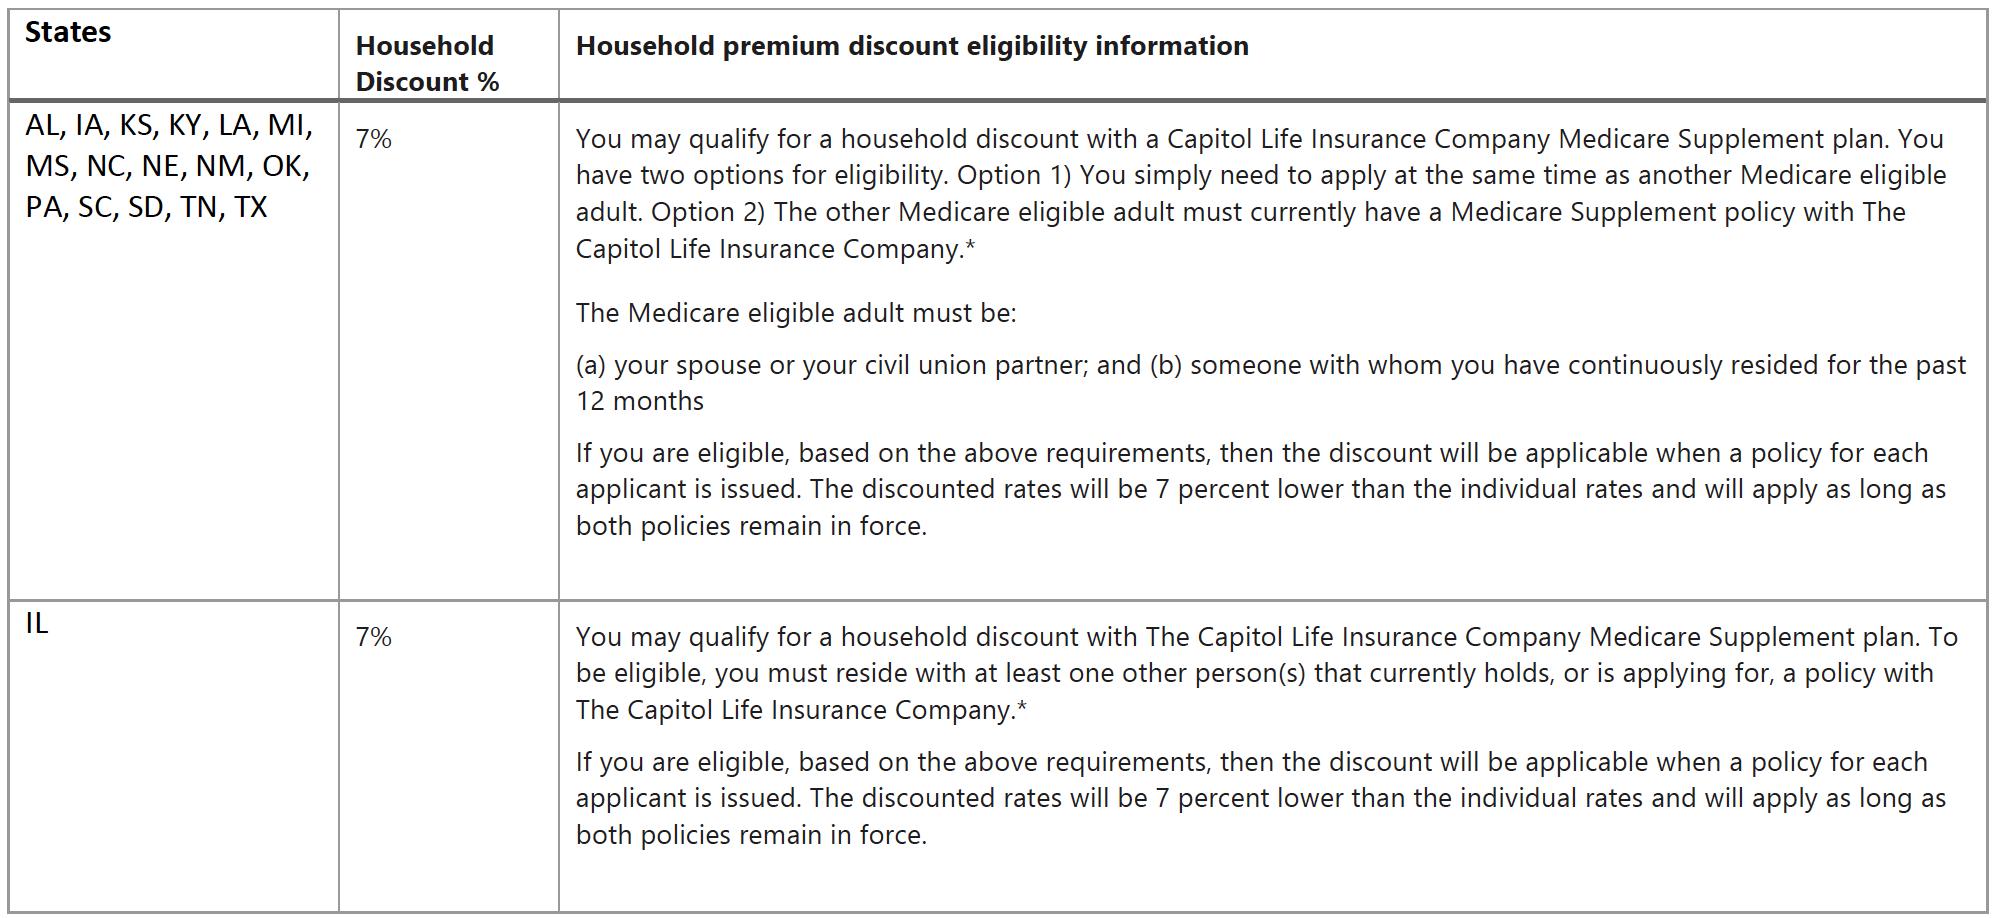 Capitol Life Medigap Household Discount